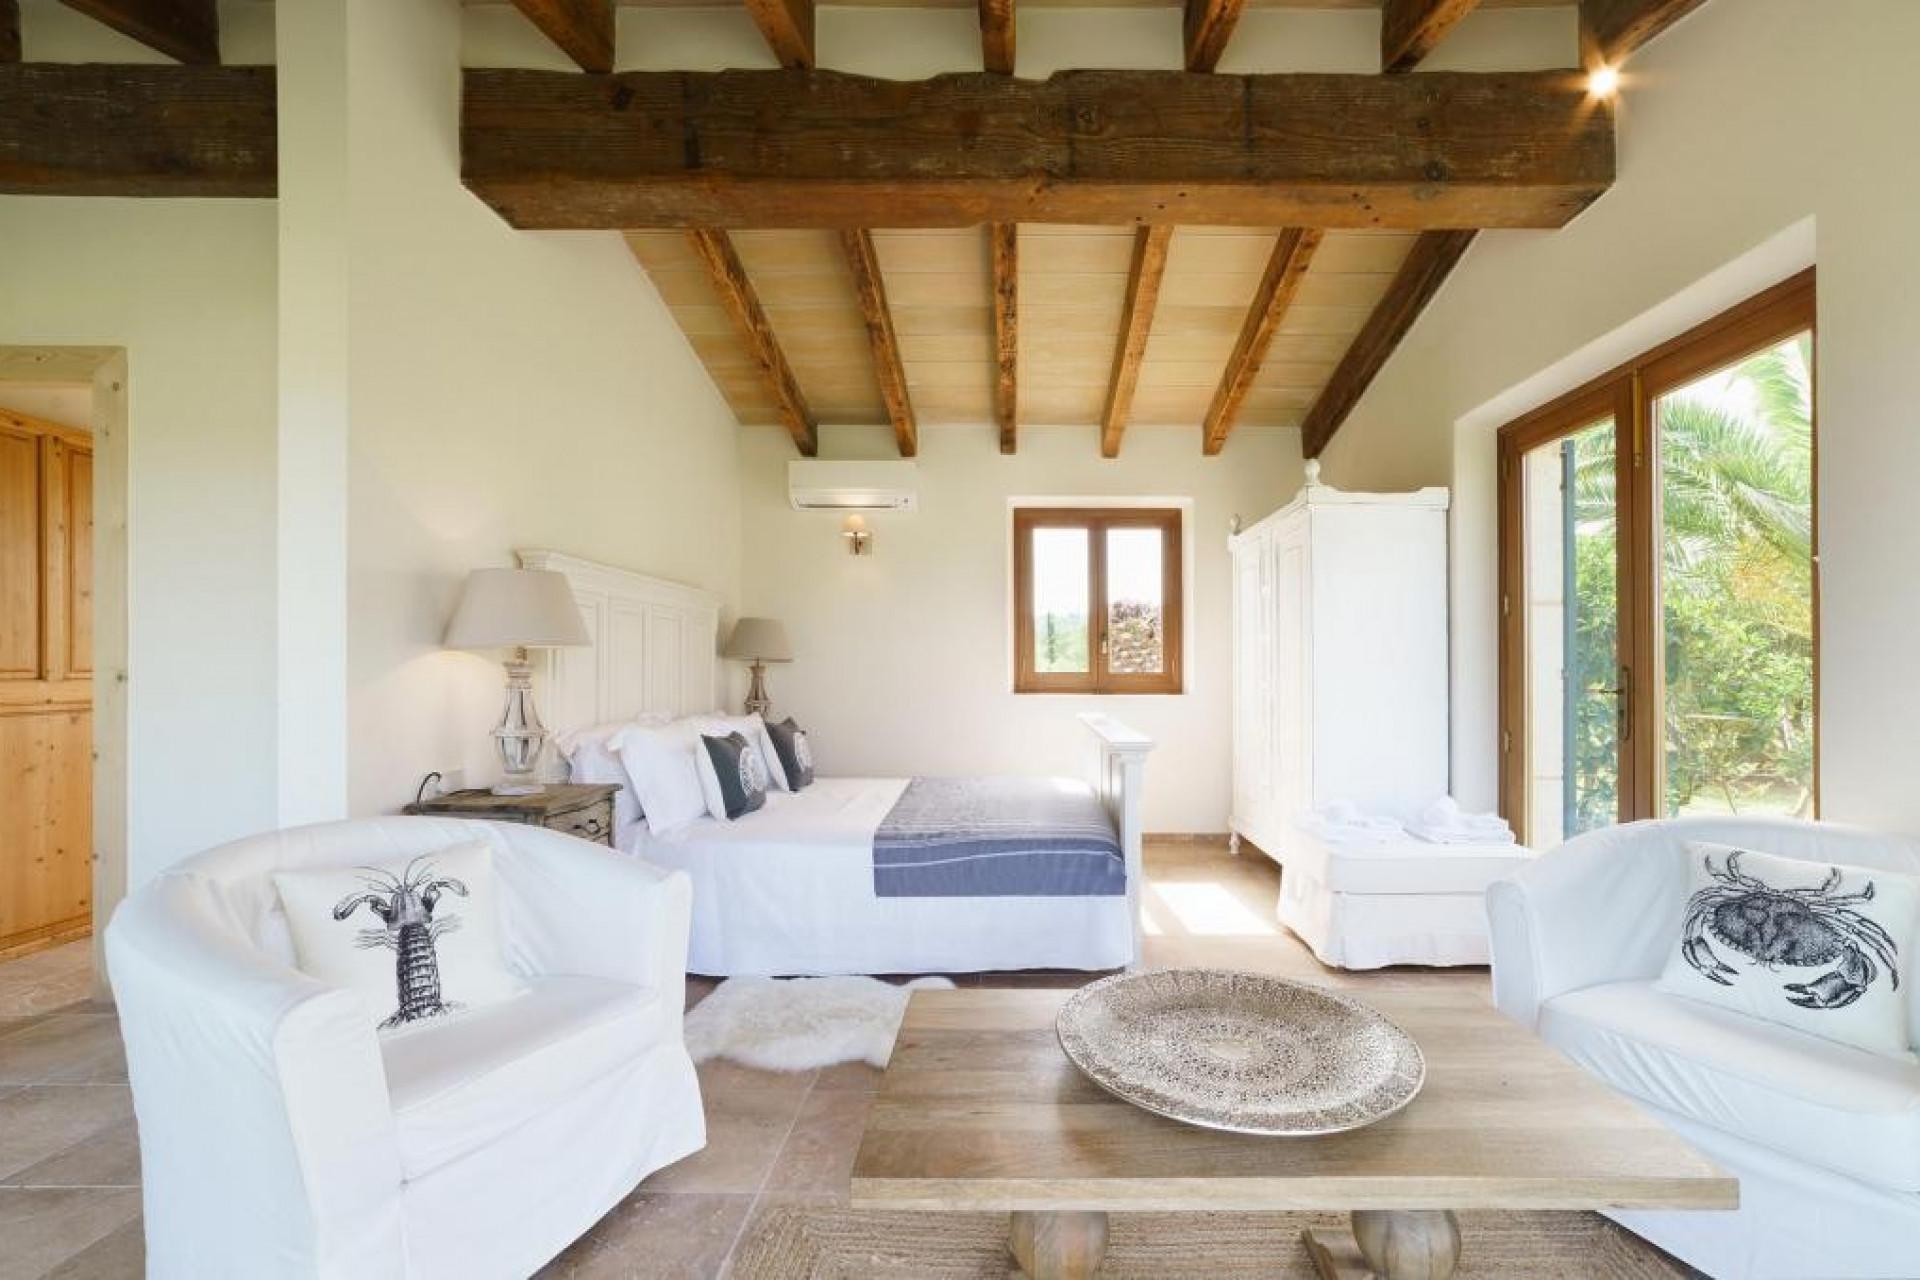 Luxury 6 Bedroom Villa Pollenca Private Pool, Home Cinema & Gym